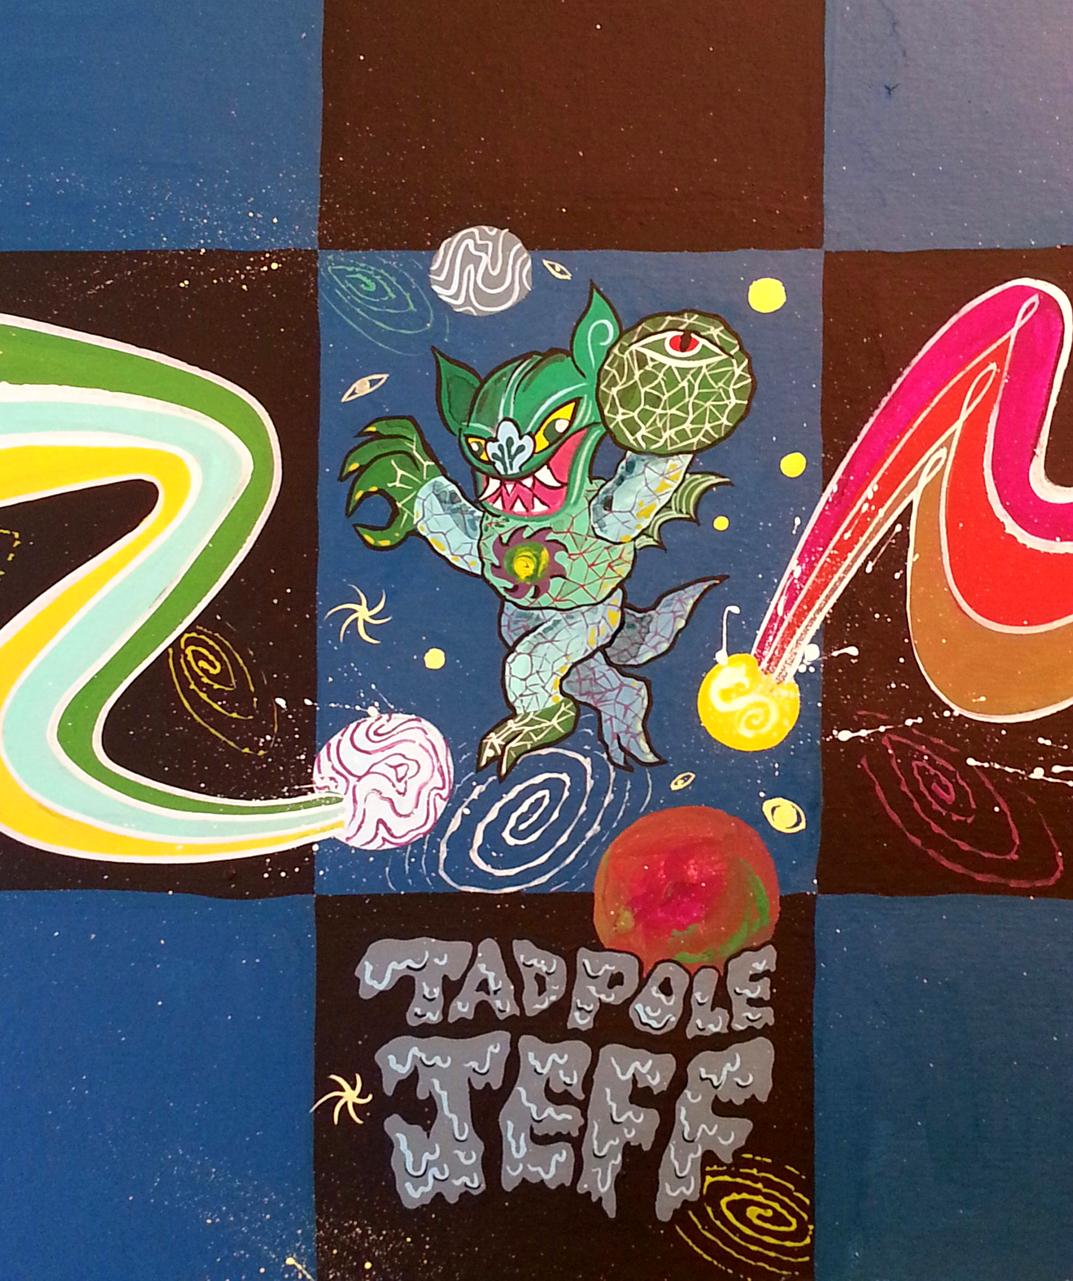 tadpole jeff box art WIP